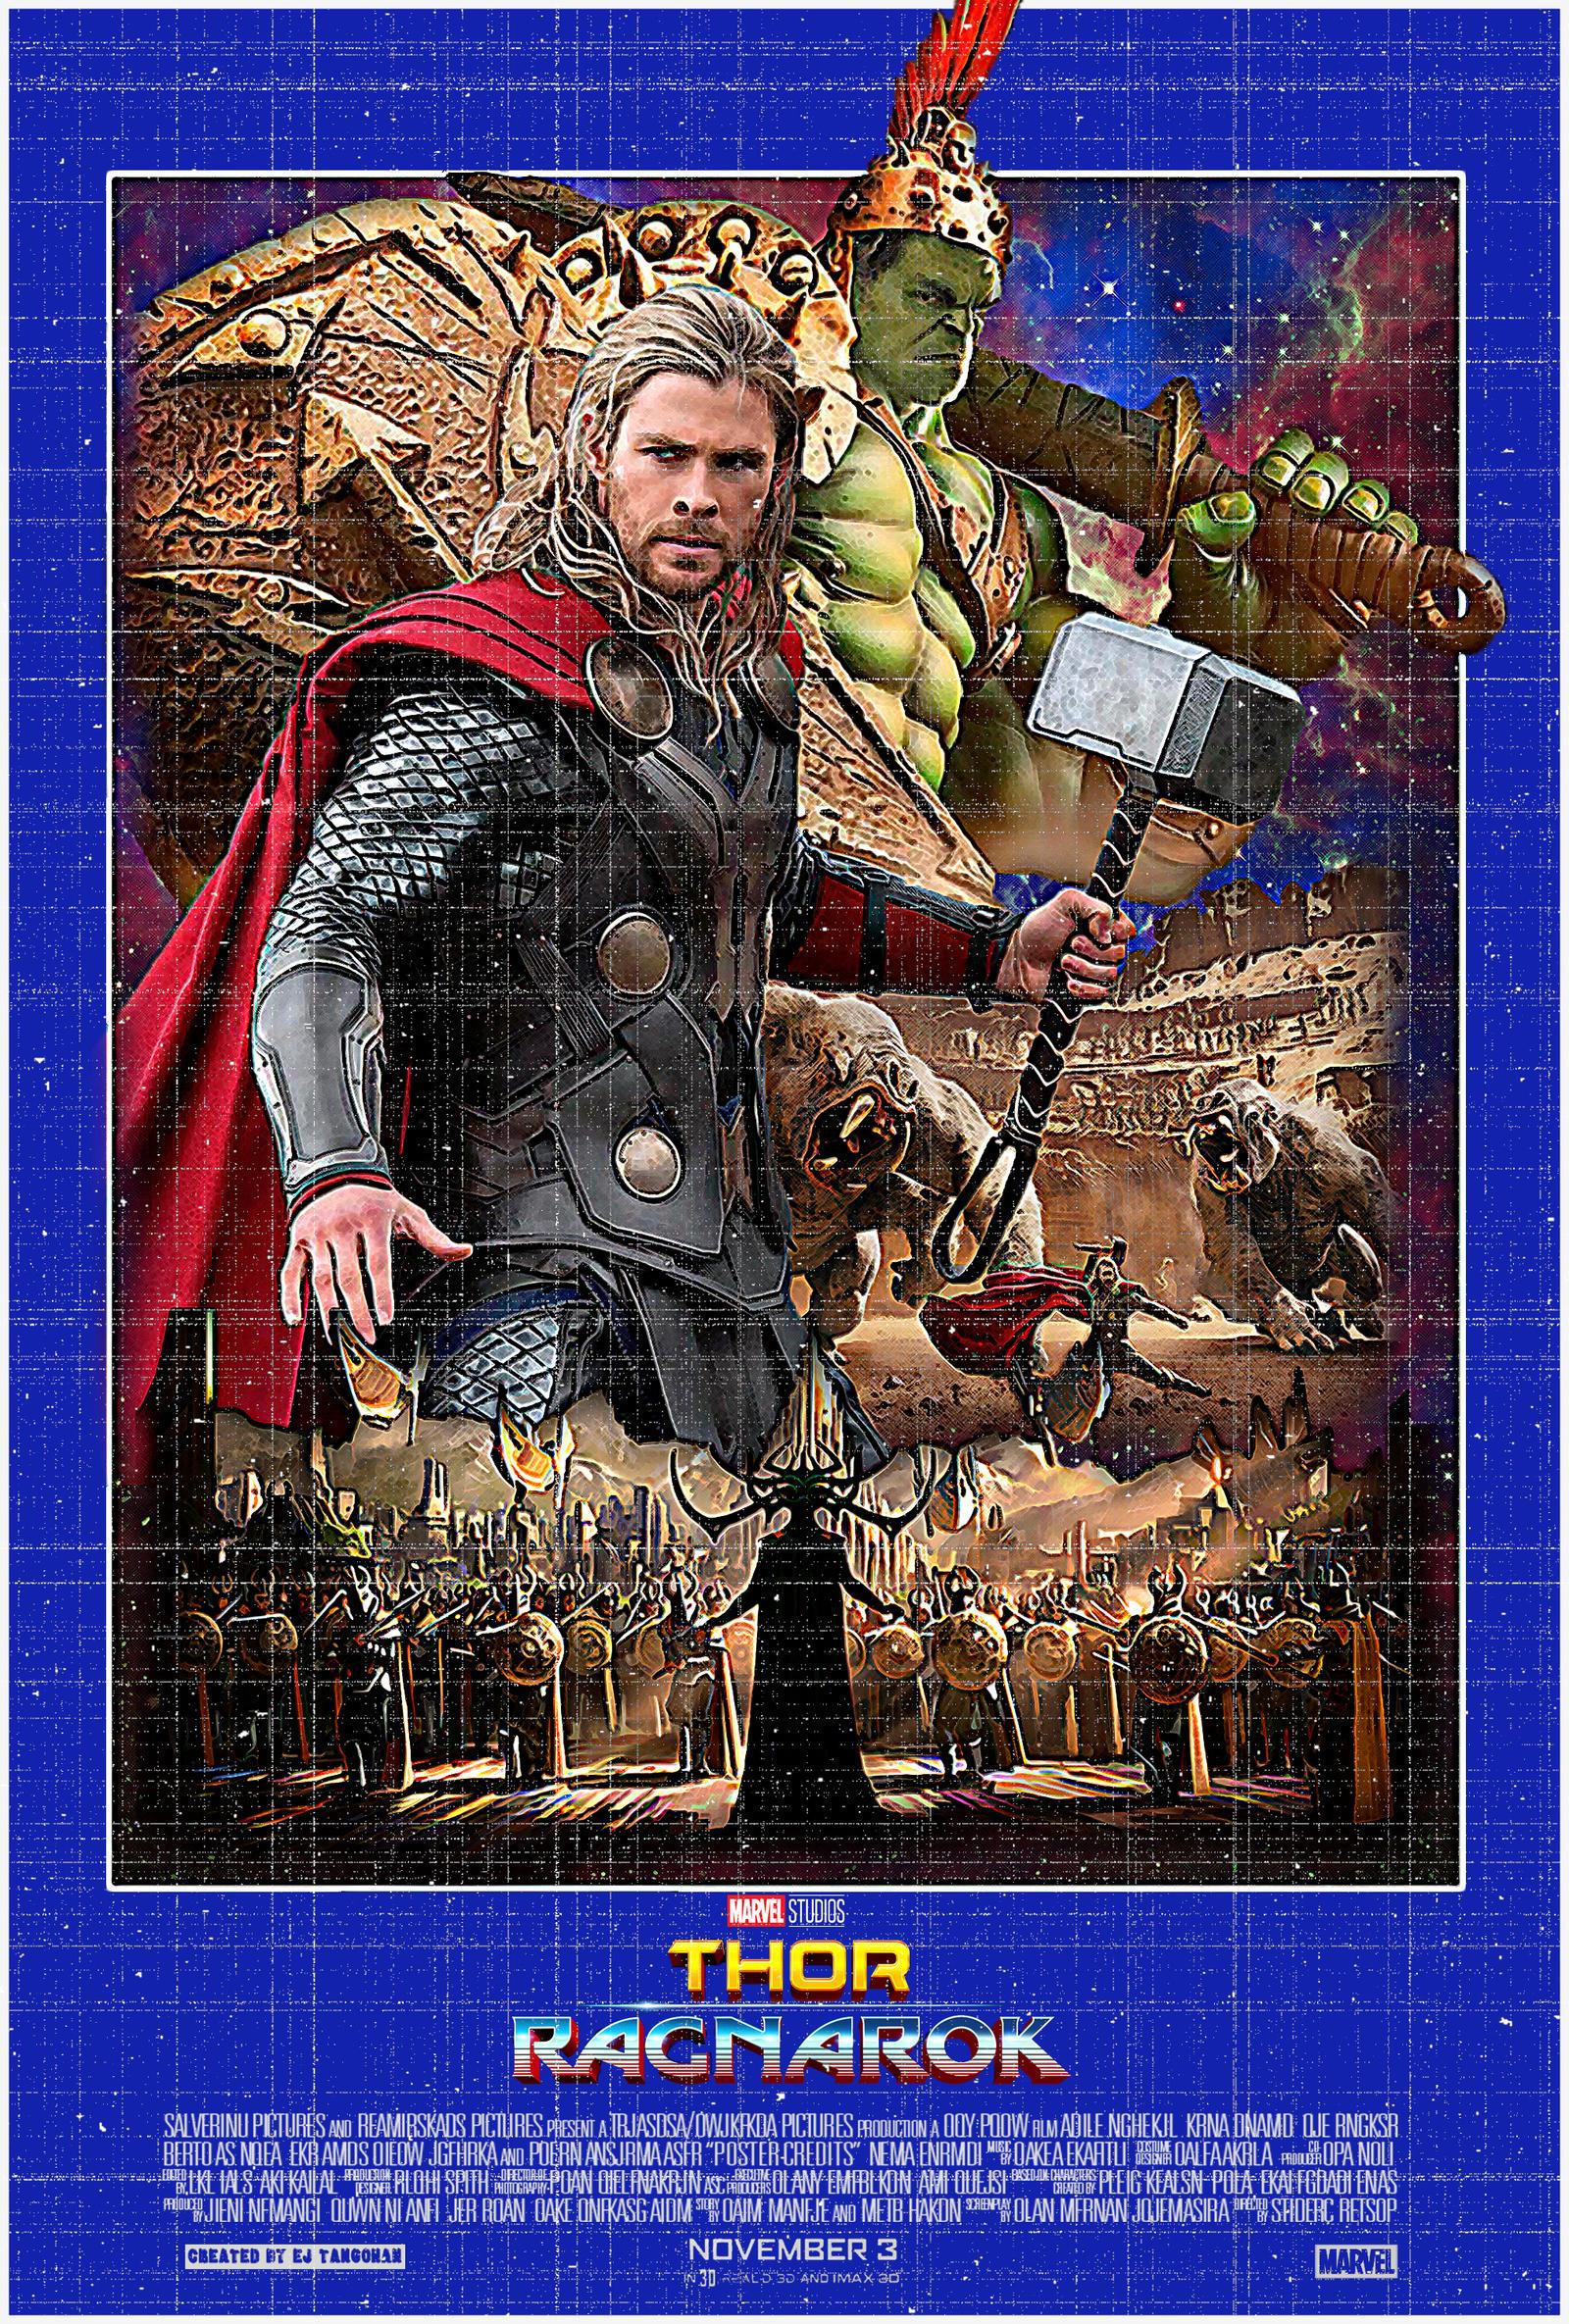 Thor Ragnarok 80s aged poster by EJTangonan